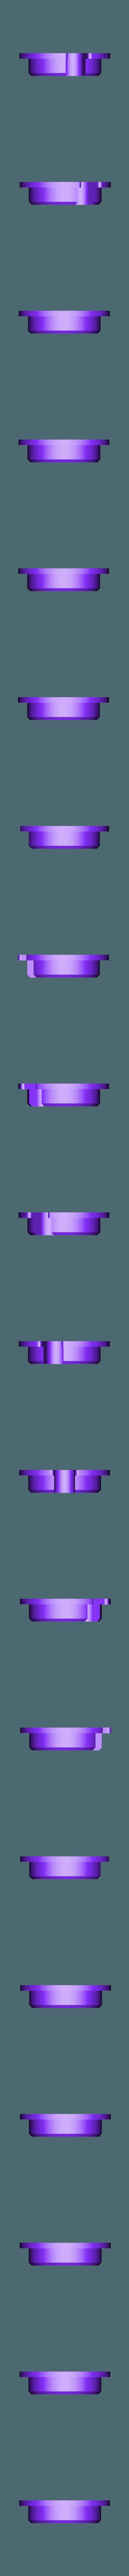 LightBox_CordRelief.STL Download free STL file Lithophane Stand Light Box LED • Model to 3D print, HoytDesign